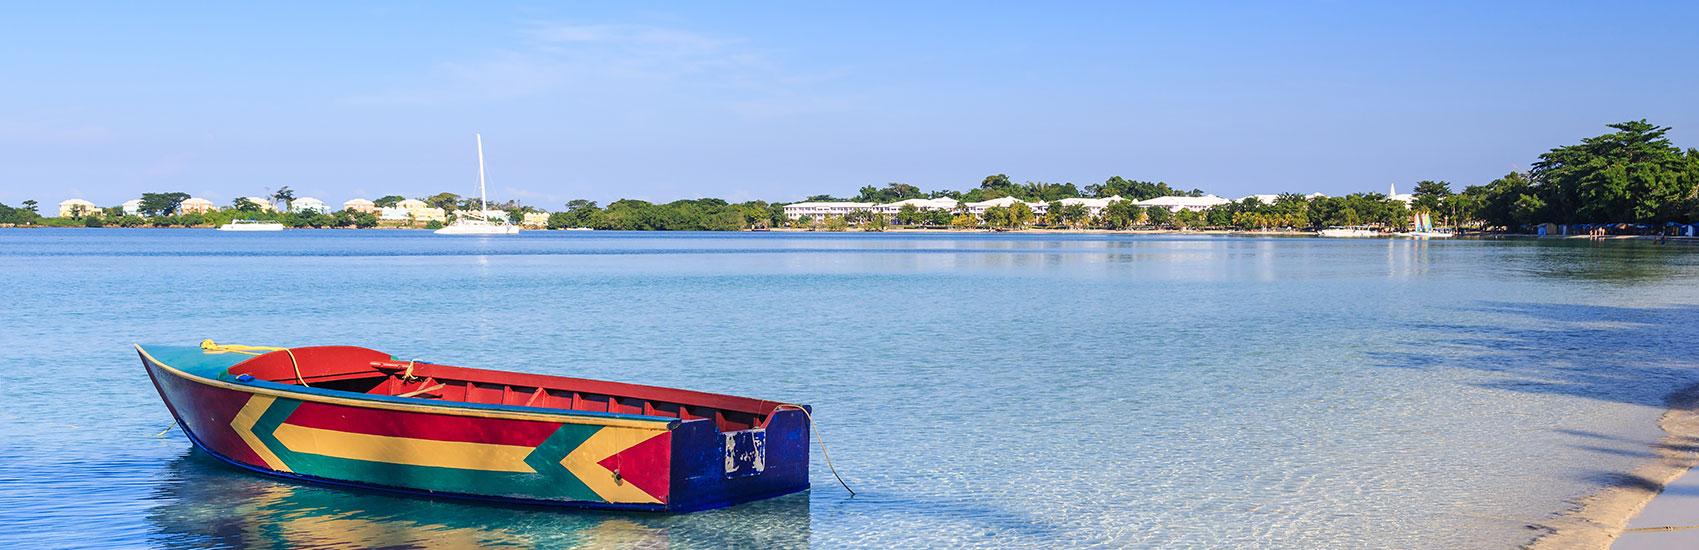 Western  Caribbean March Break 2023 Cruise 1